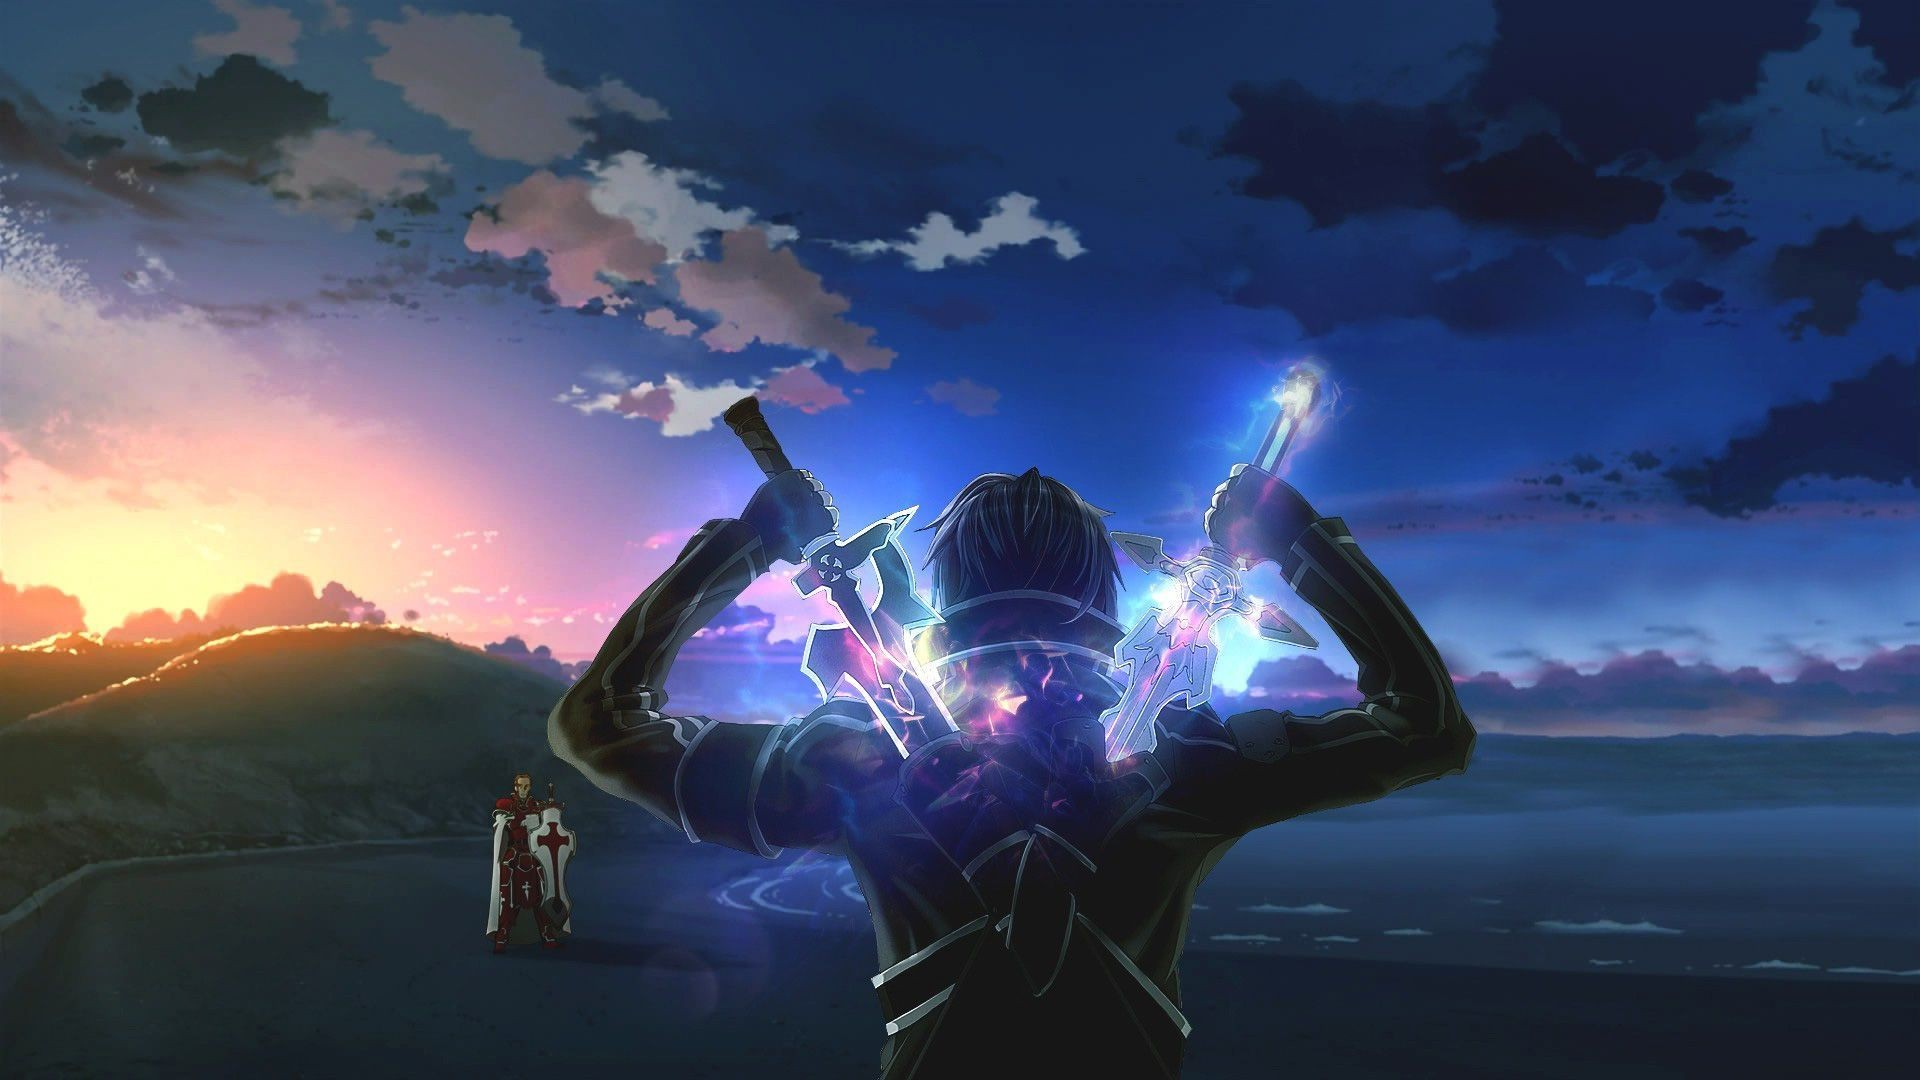 Sword Art Online Background 1 Download Free Beautiful High